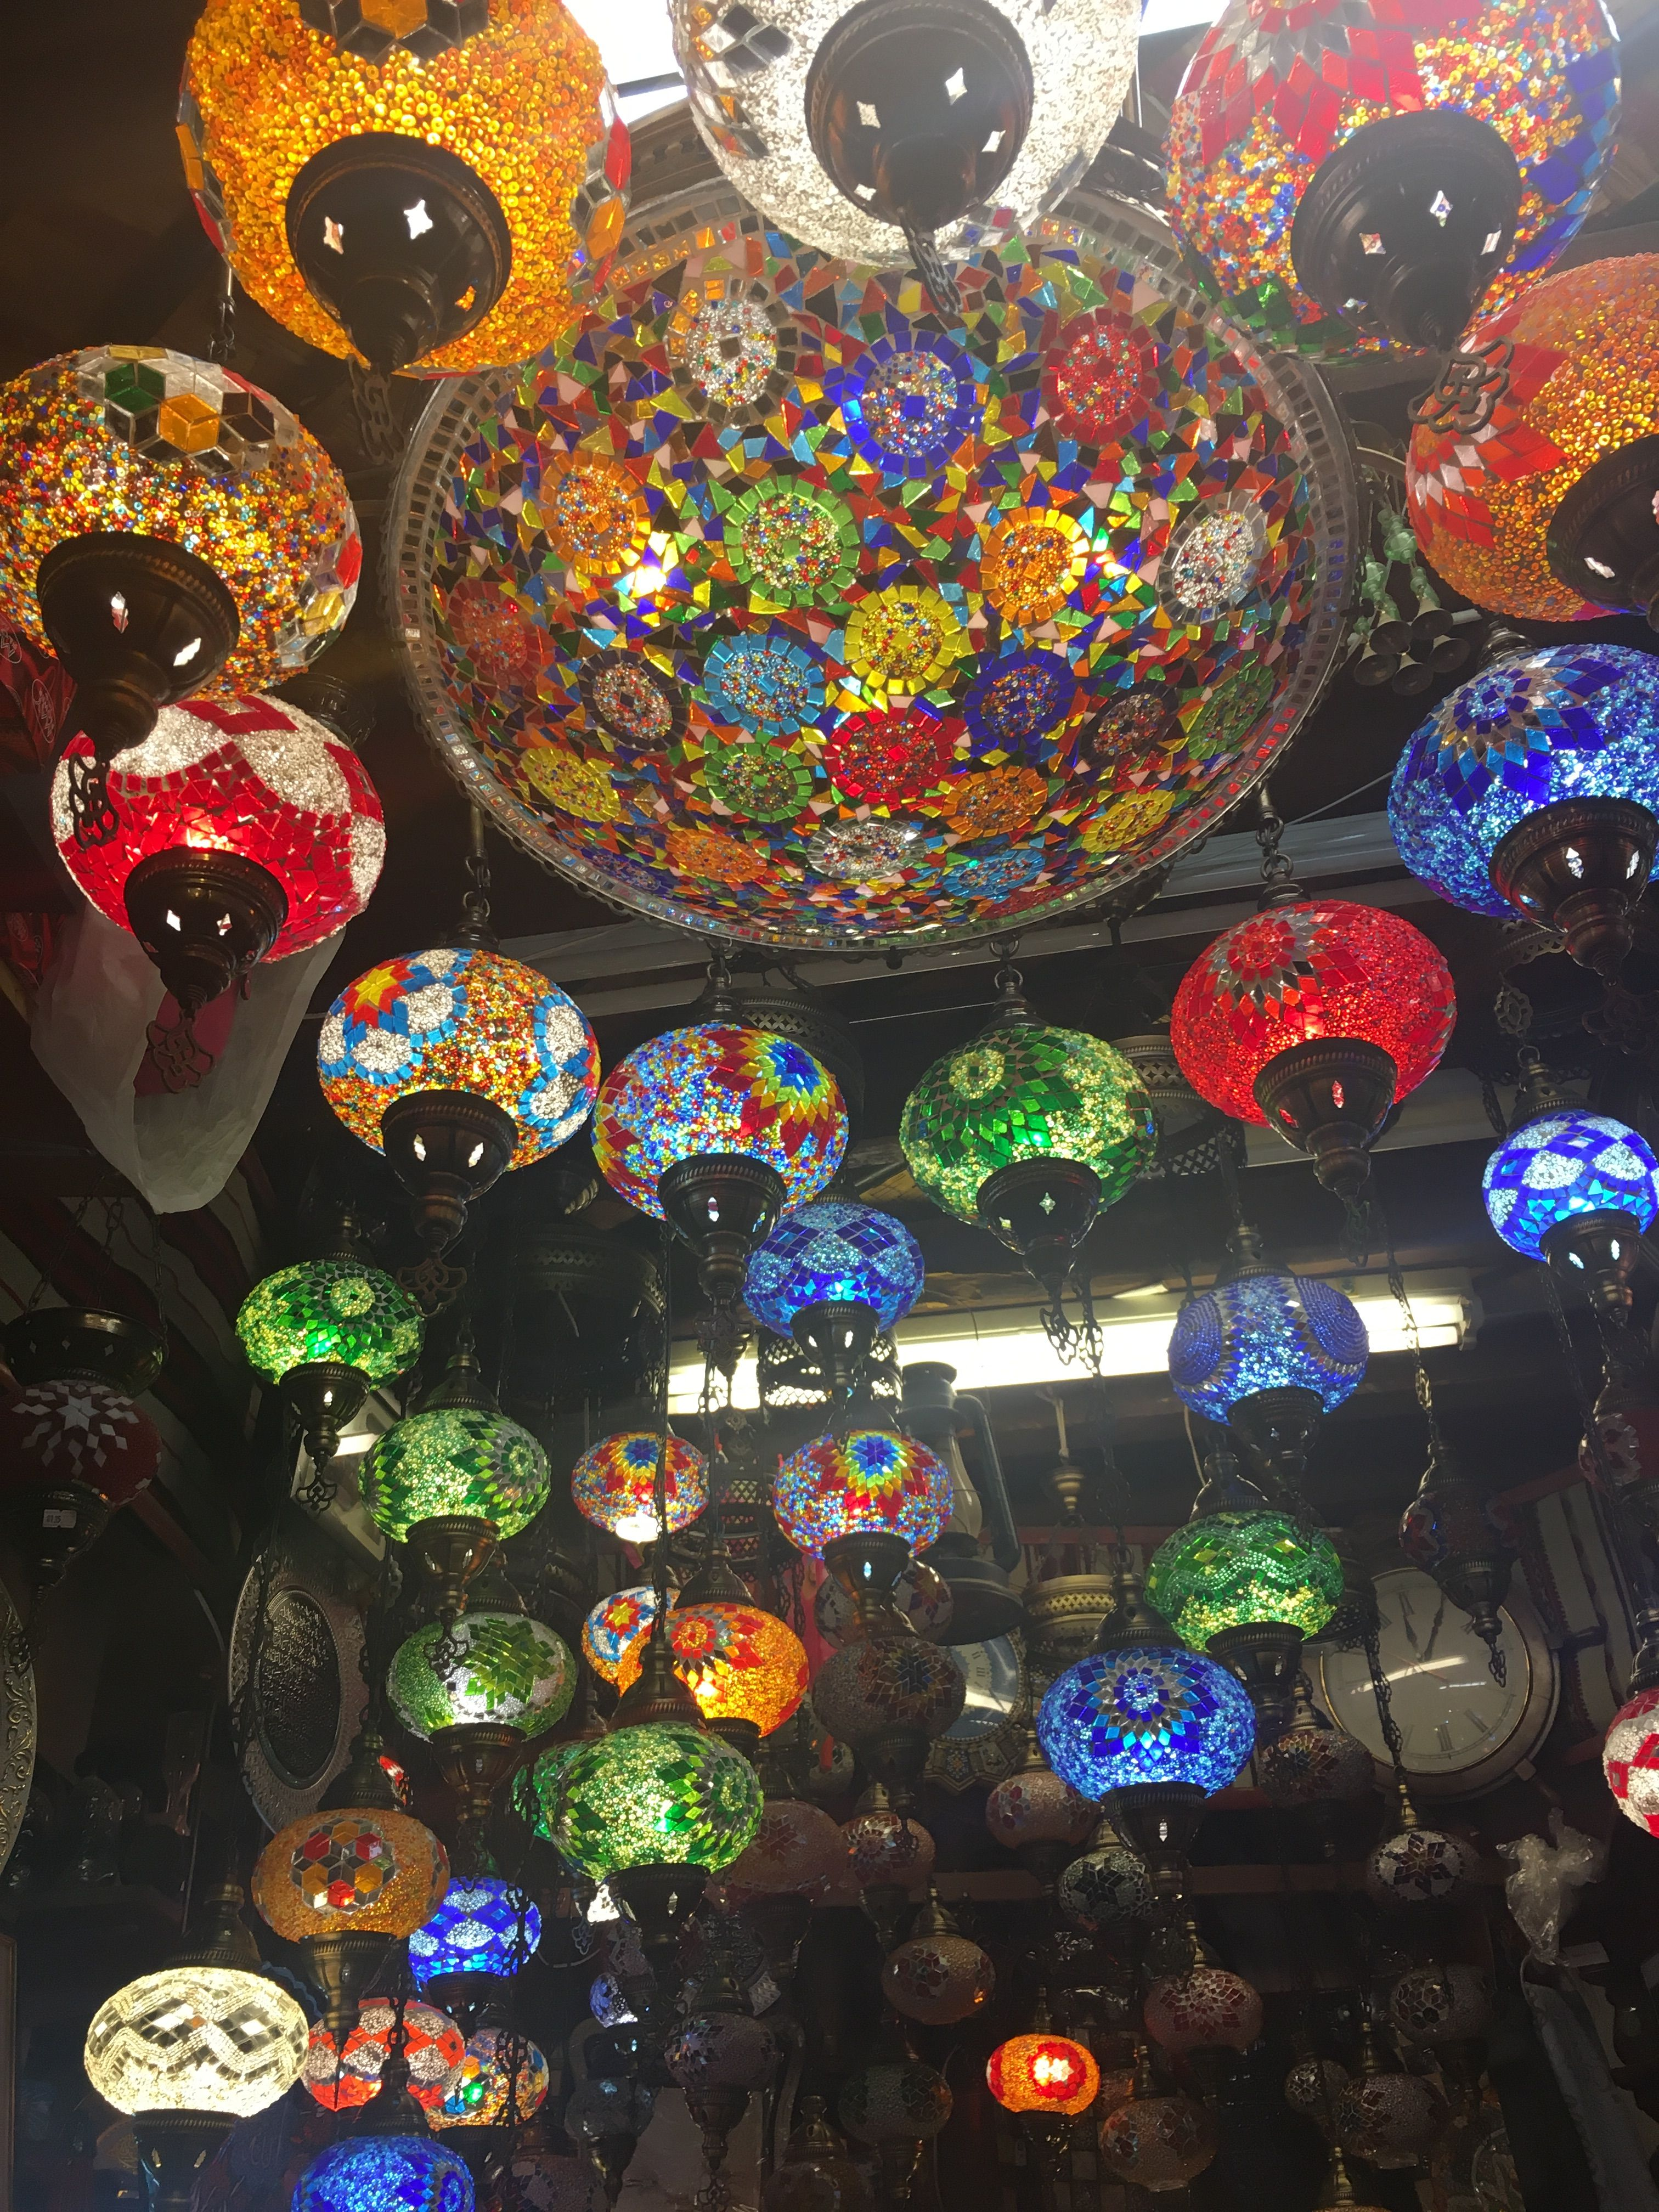 Souq Waqif Qatar Christmas Bulbs Christmas Ornaments Holiday Decor